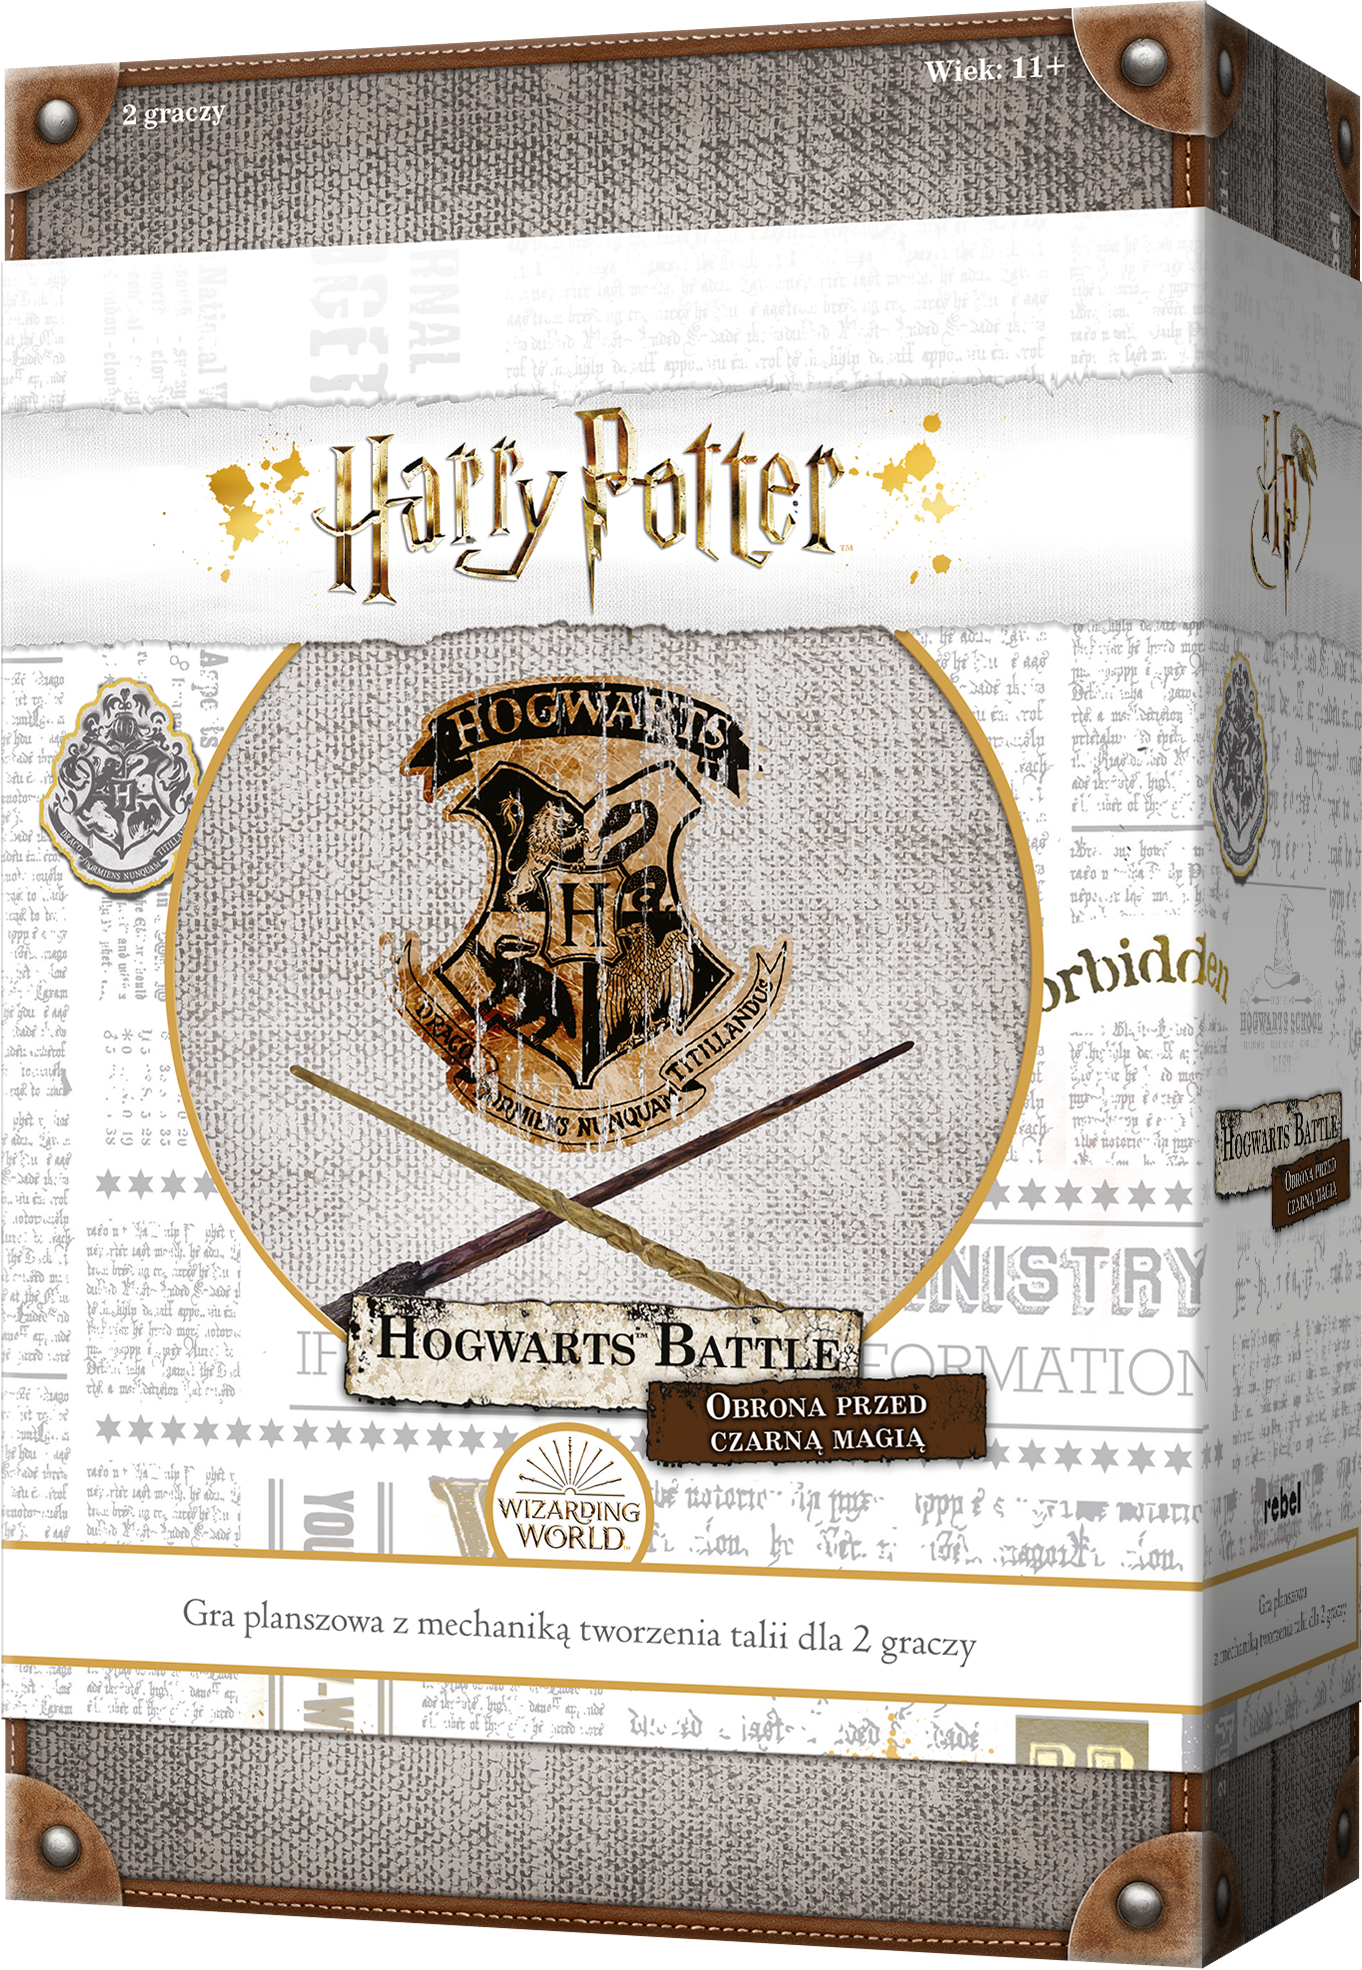 Harry Potter: Hogwarts Battle - Obrona przed czarną magią